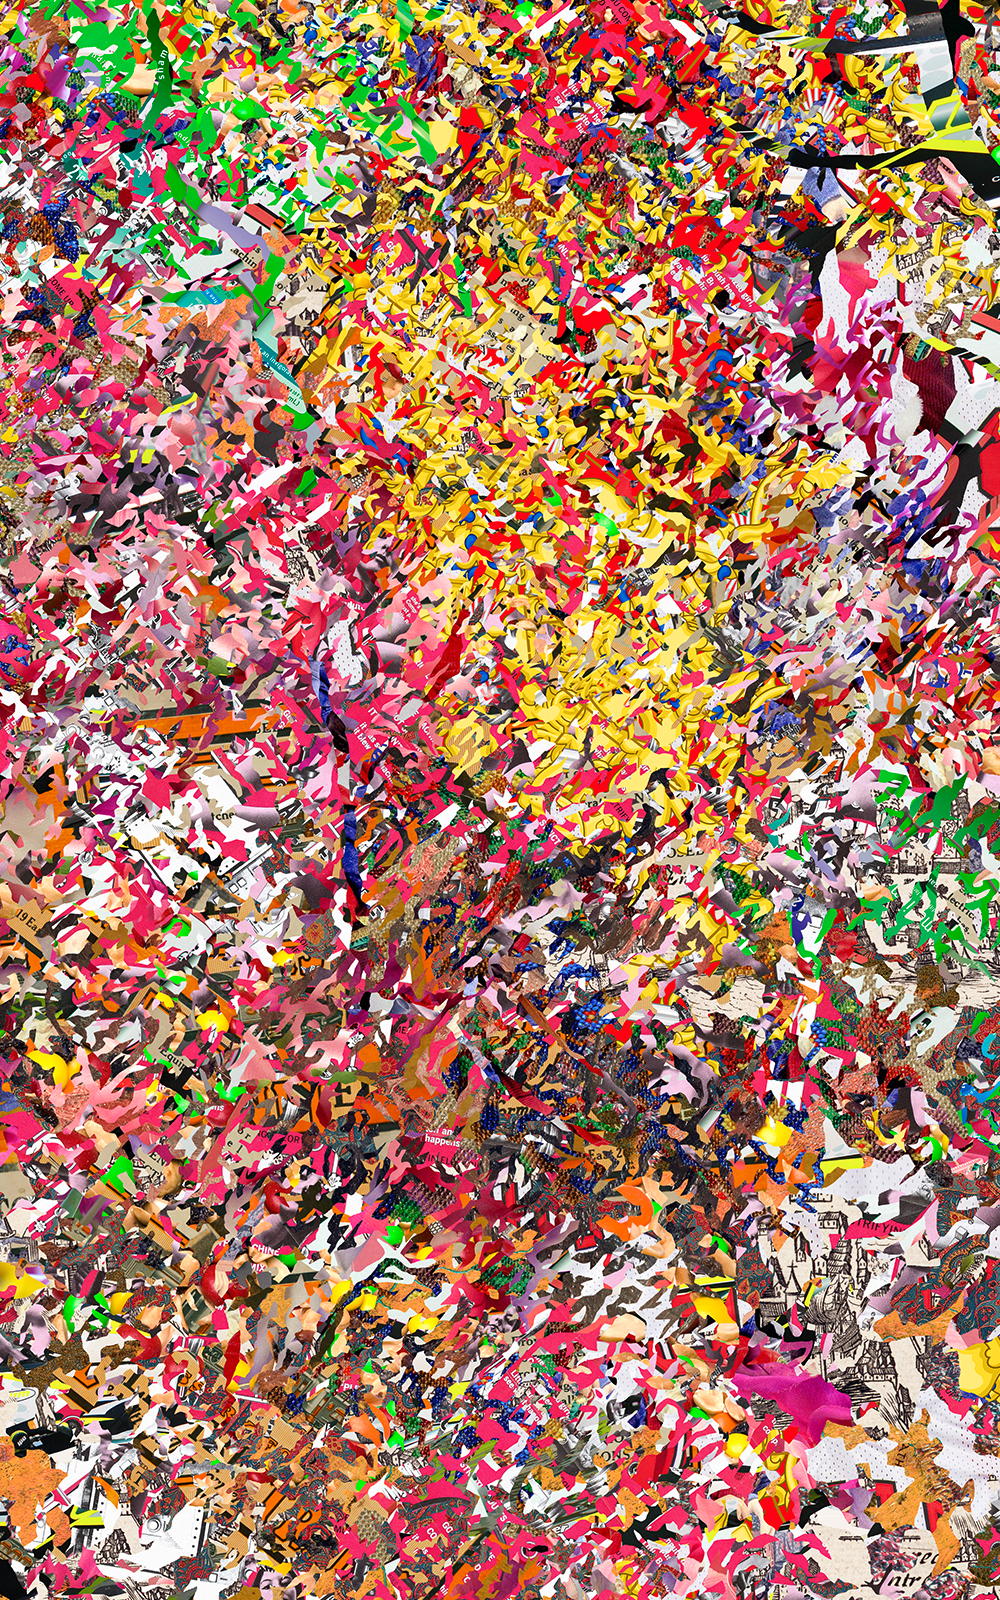 Case Simmons, Simmons & Burke, Cherry Bomb, Dutchmasters, Kohn Gallery,Pigment Print, Digital Collage,Digital Art, Photoshop Collage, Contemporary Collage, Photoshop Actions, Case Simmons Art, Collage Fine Art